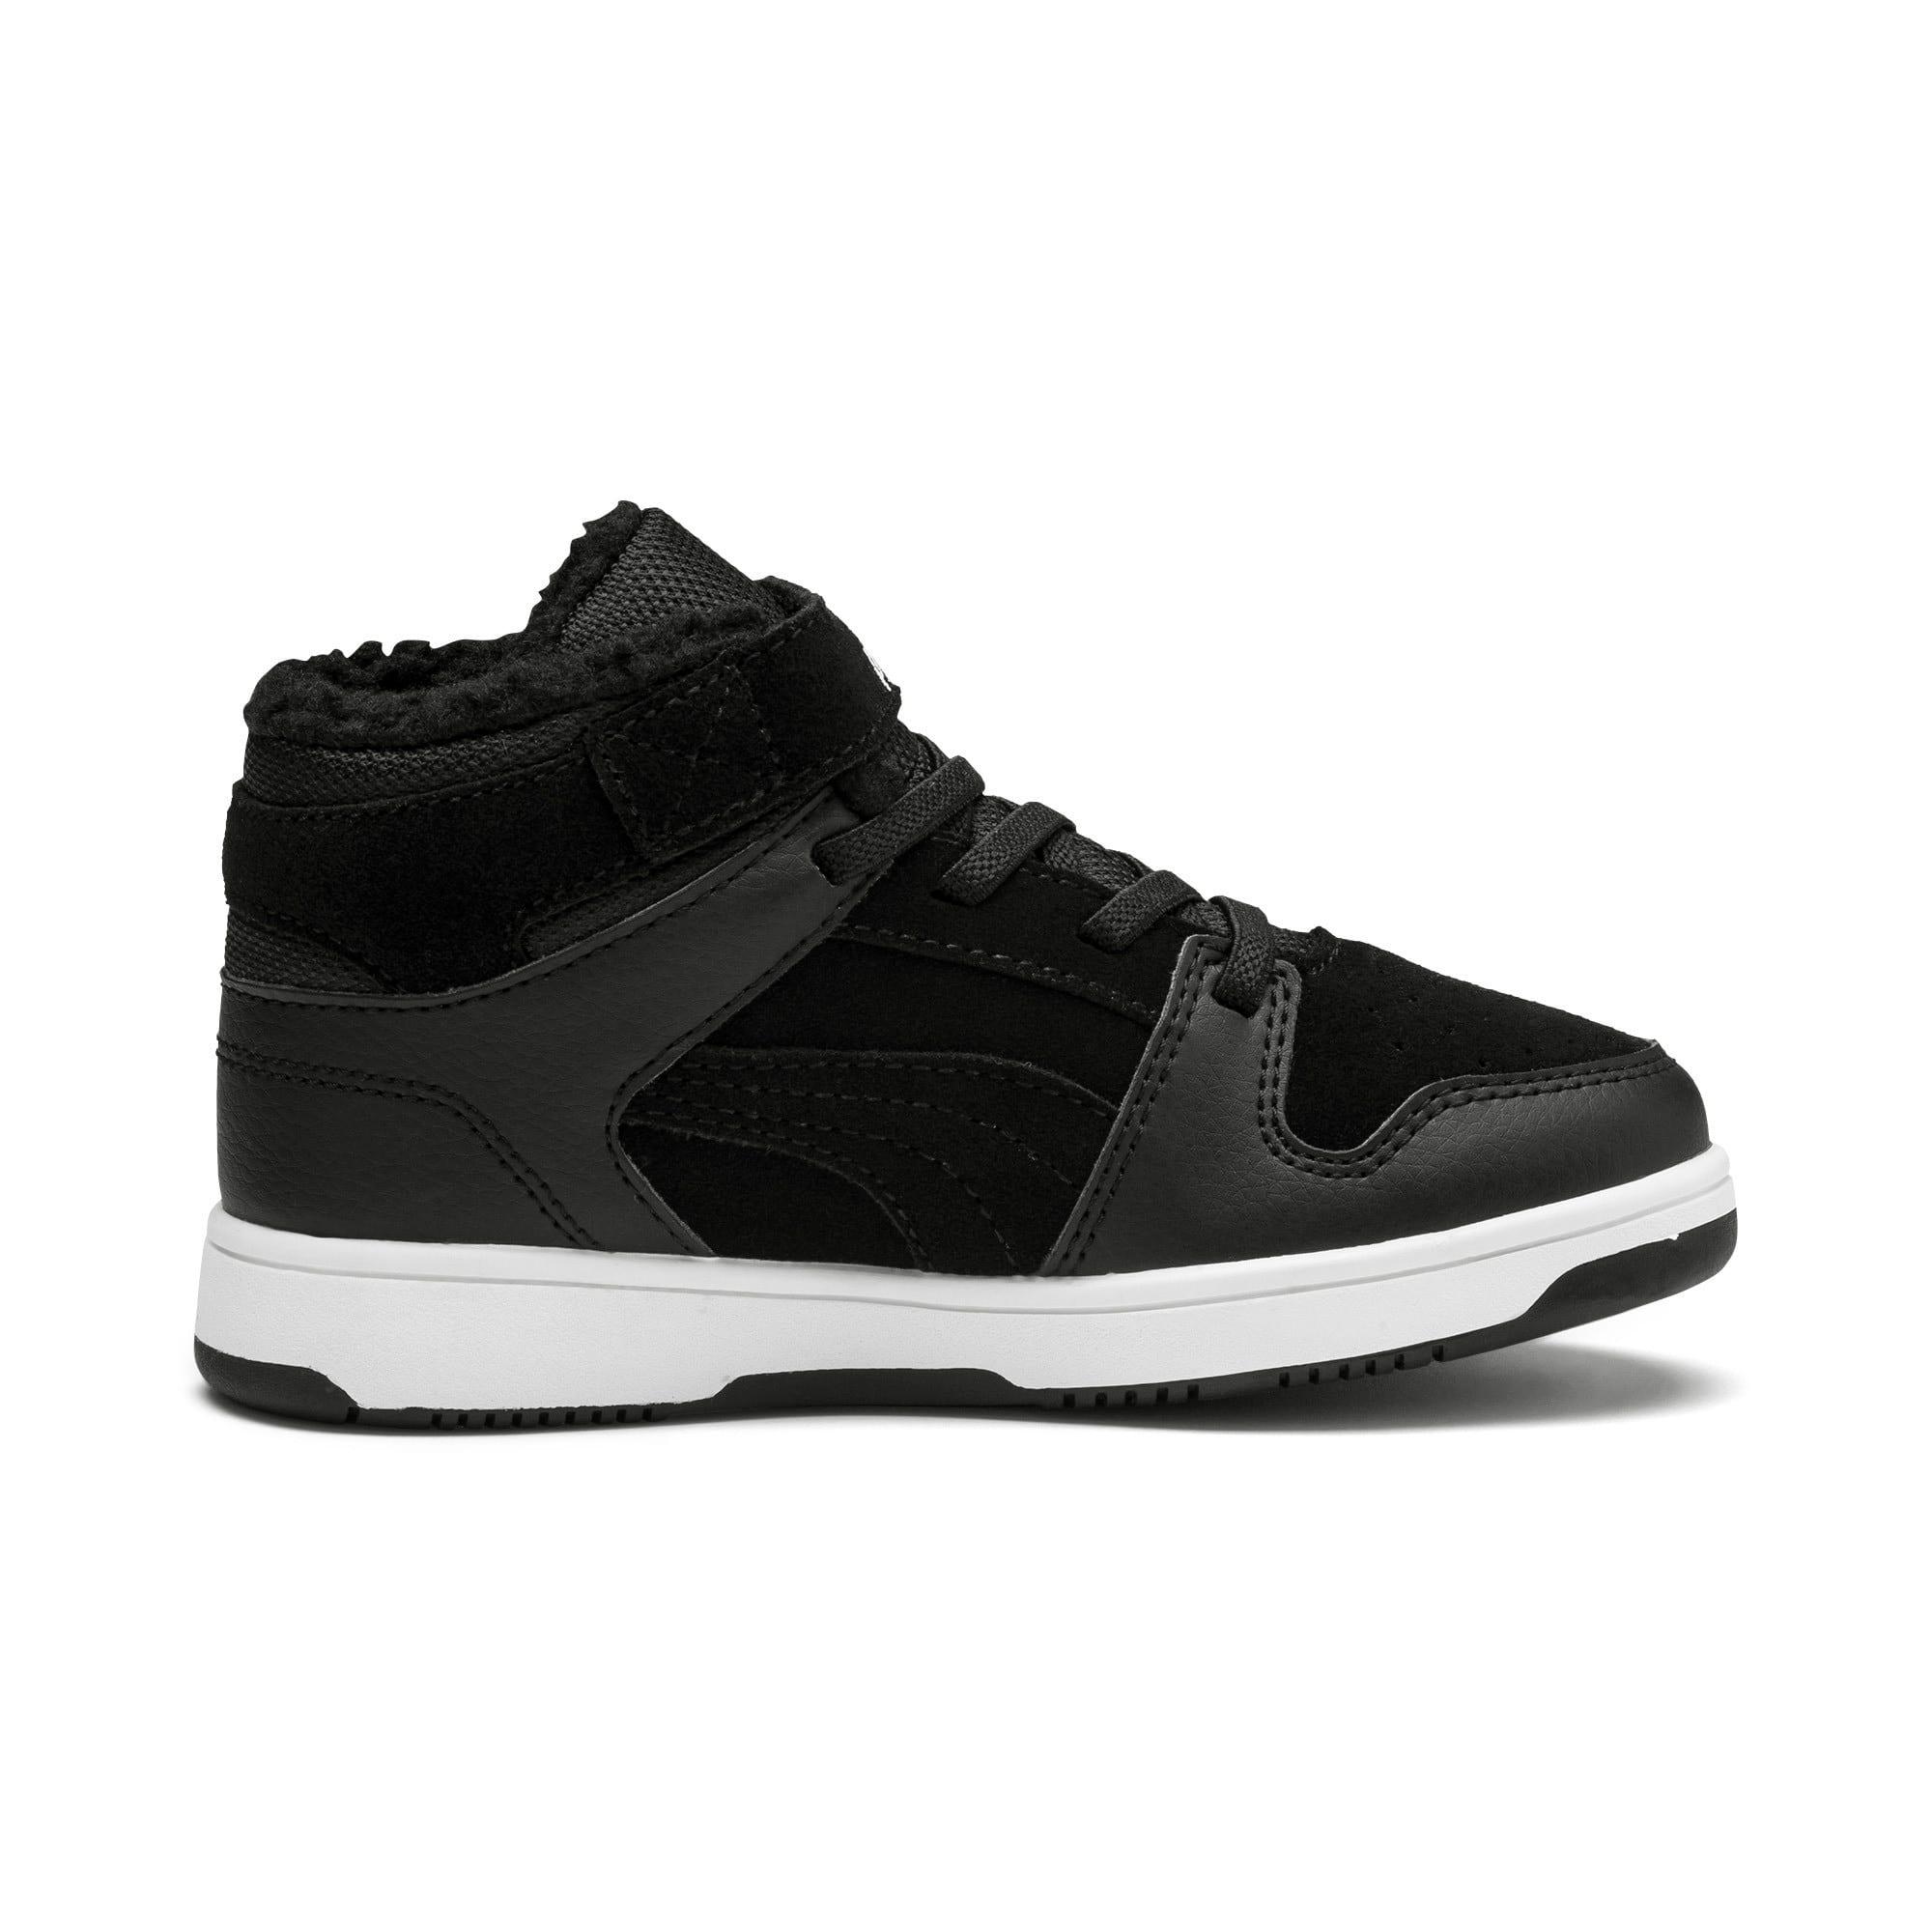 Thumbnail 5 of Rebound Lay-Up Fur V Kids Sneaker, Puma Black-Puma White, medium